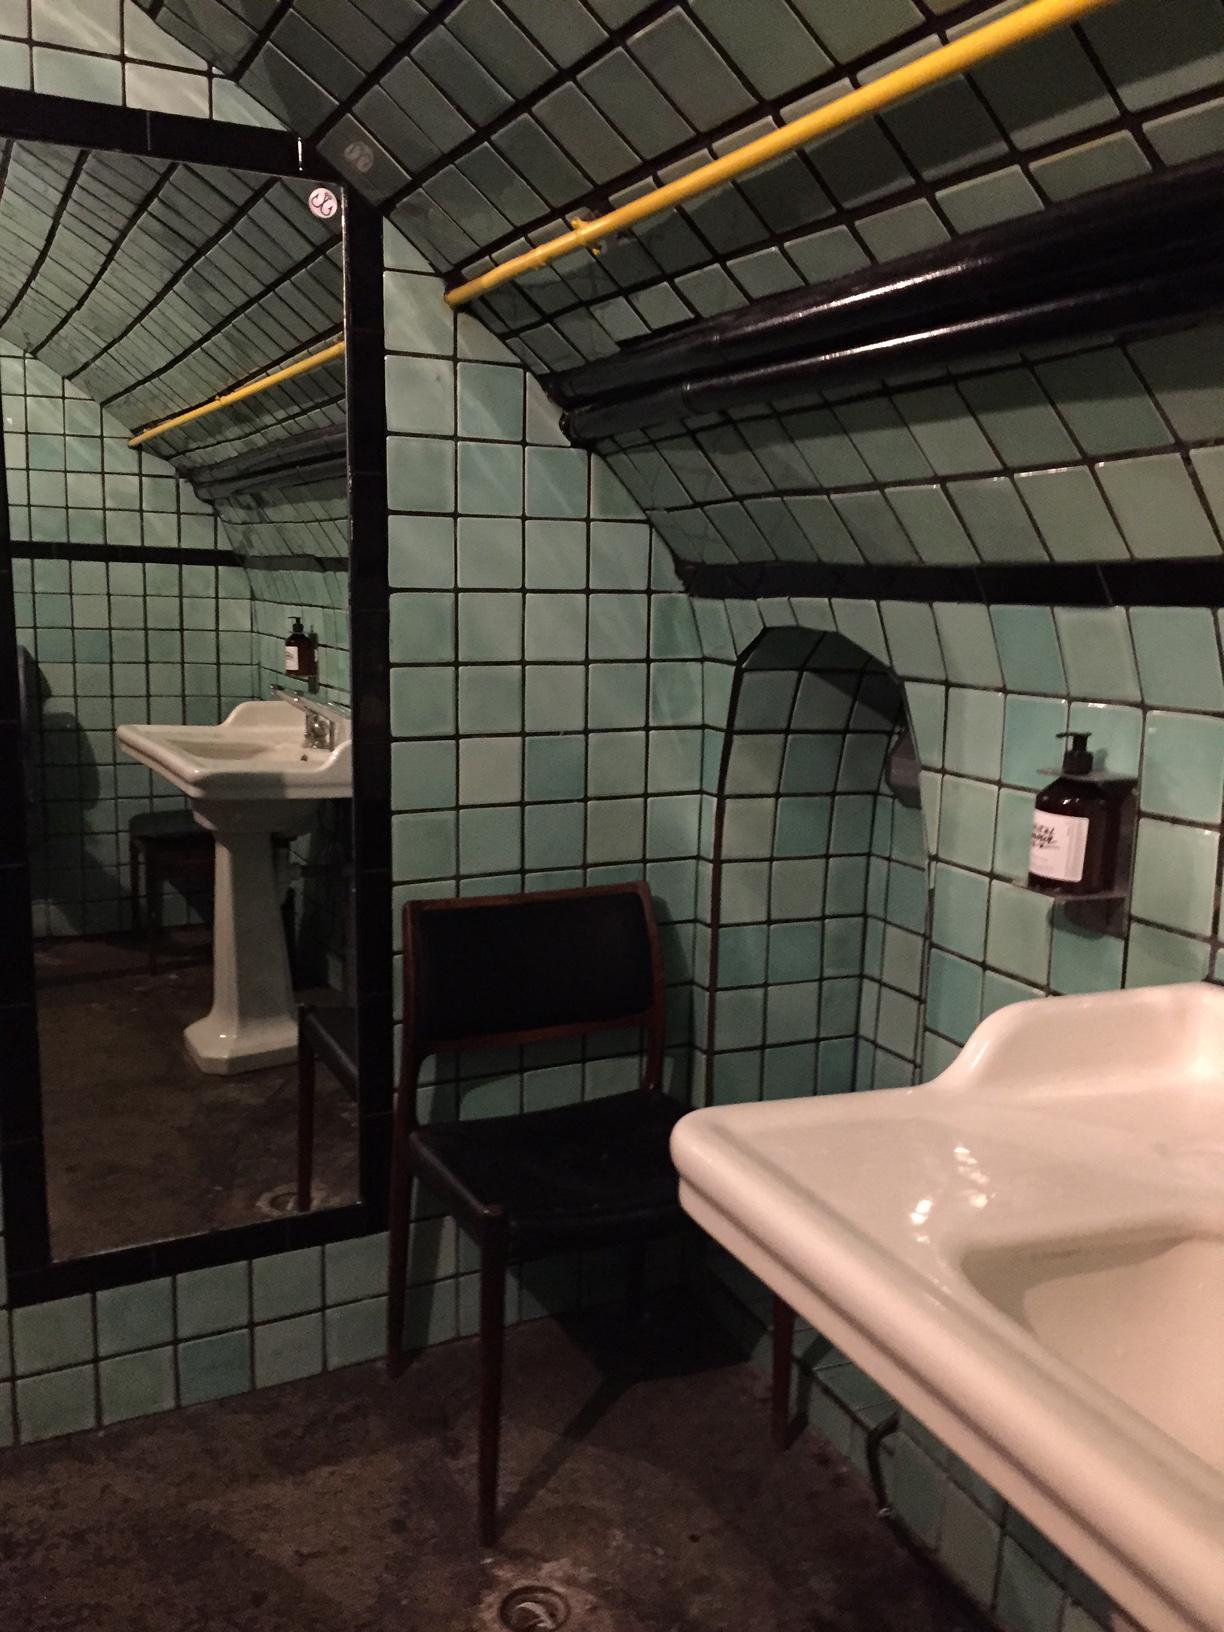 Vintage aqua tiles in the vaulted bathroom.